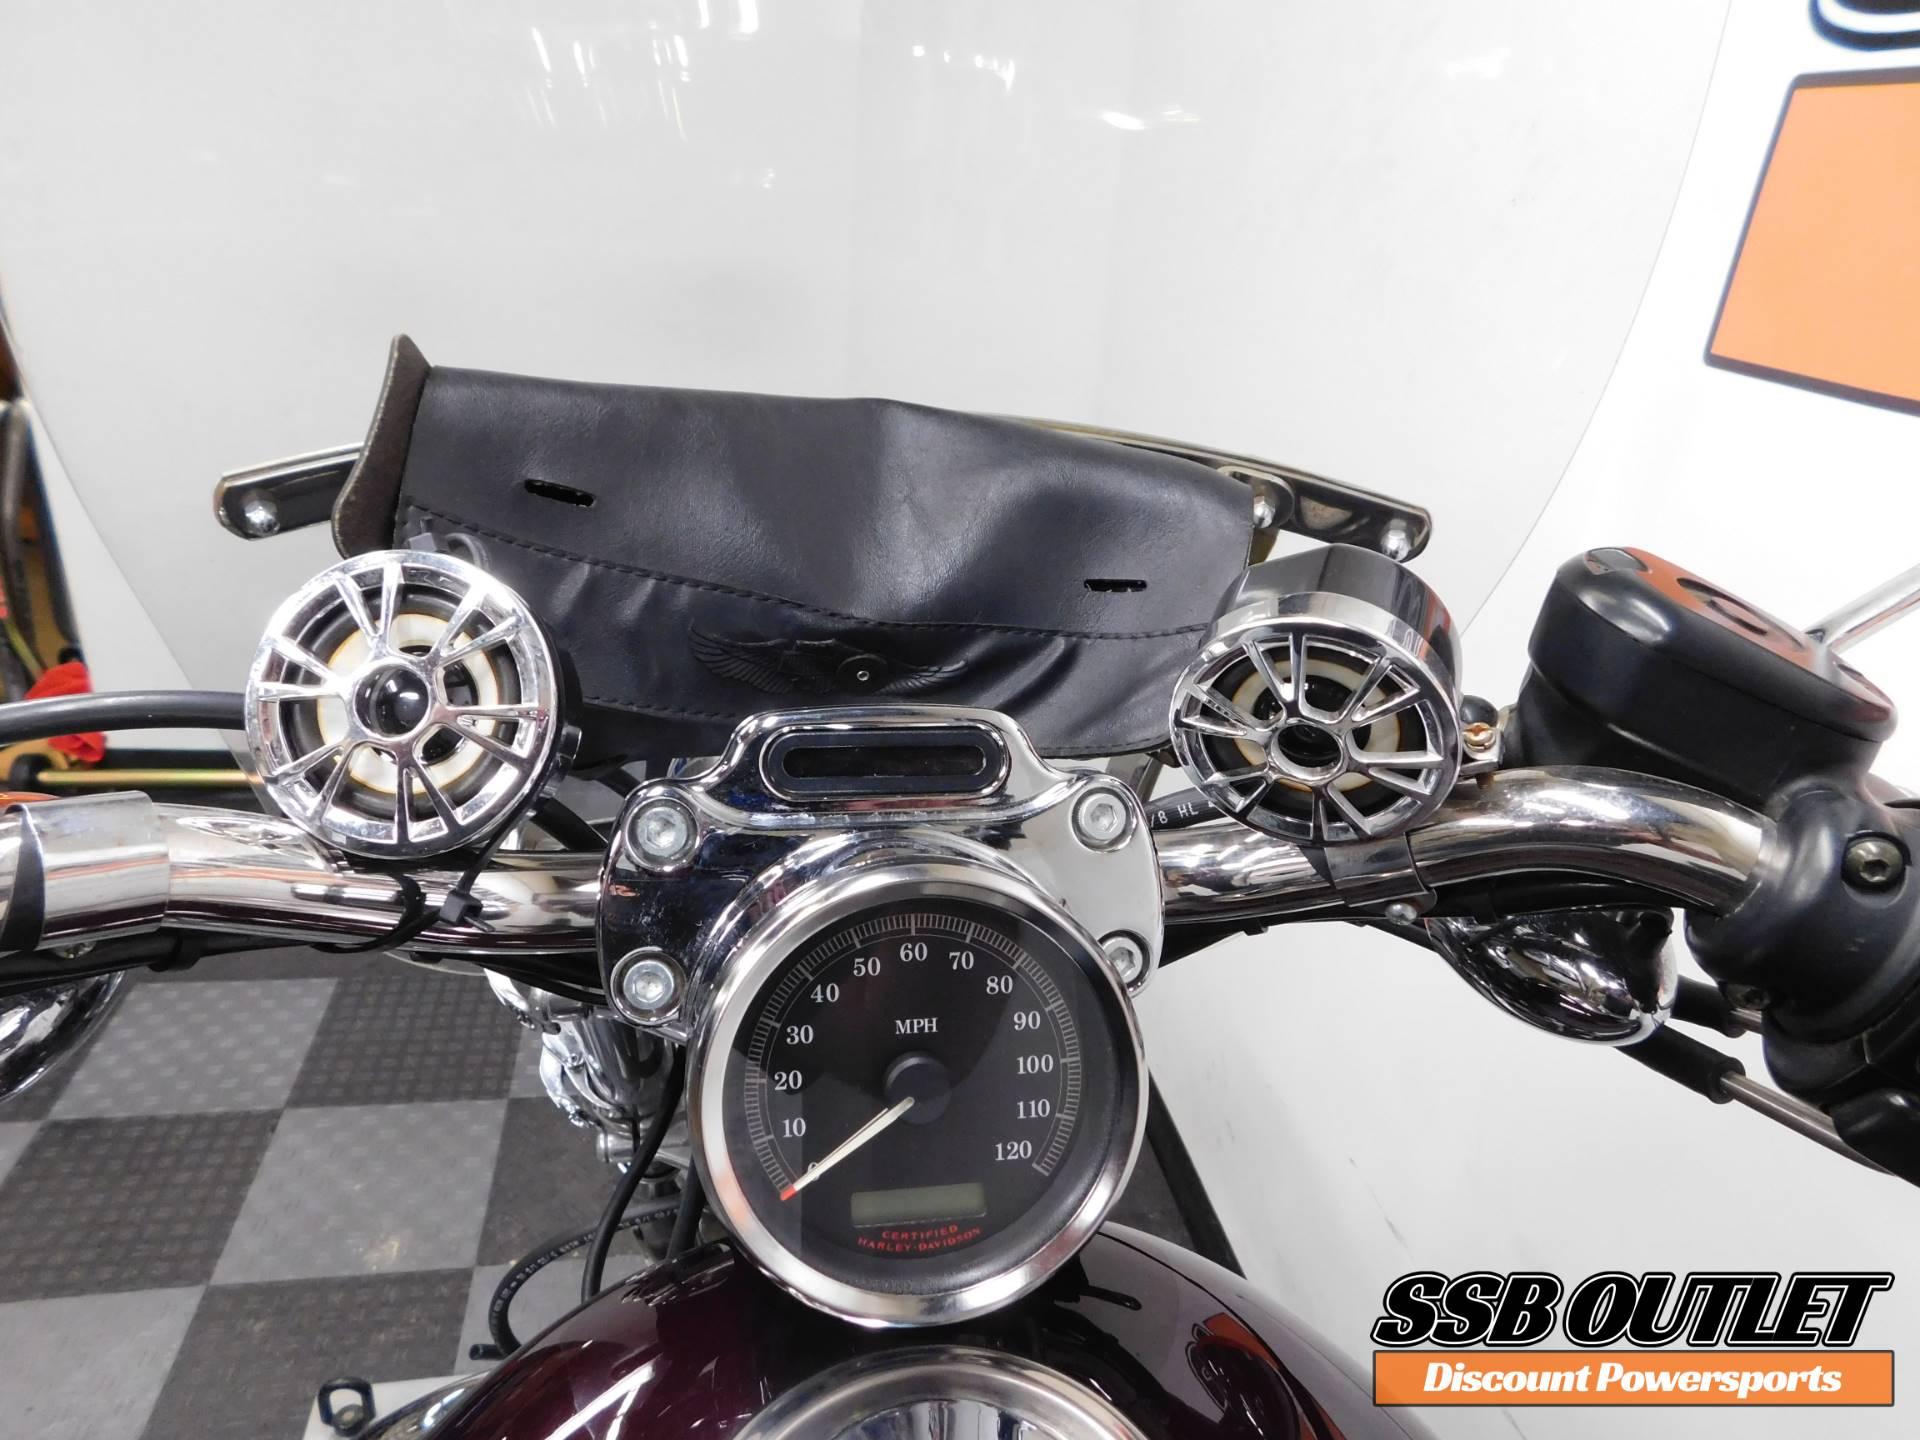 2006 Harley-Davidson Sportster 1200 Custom 9